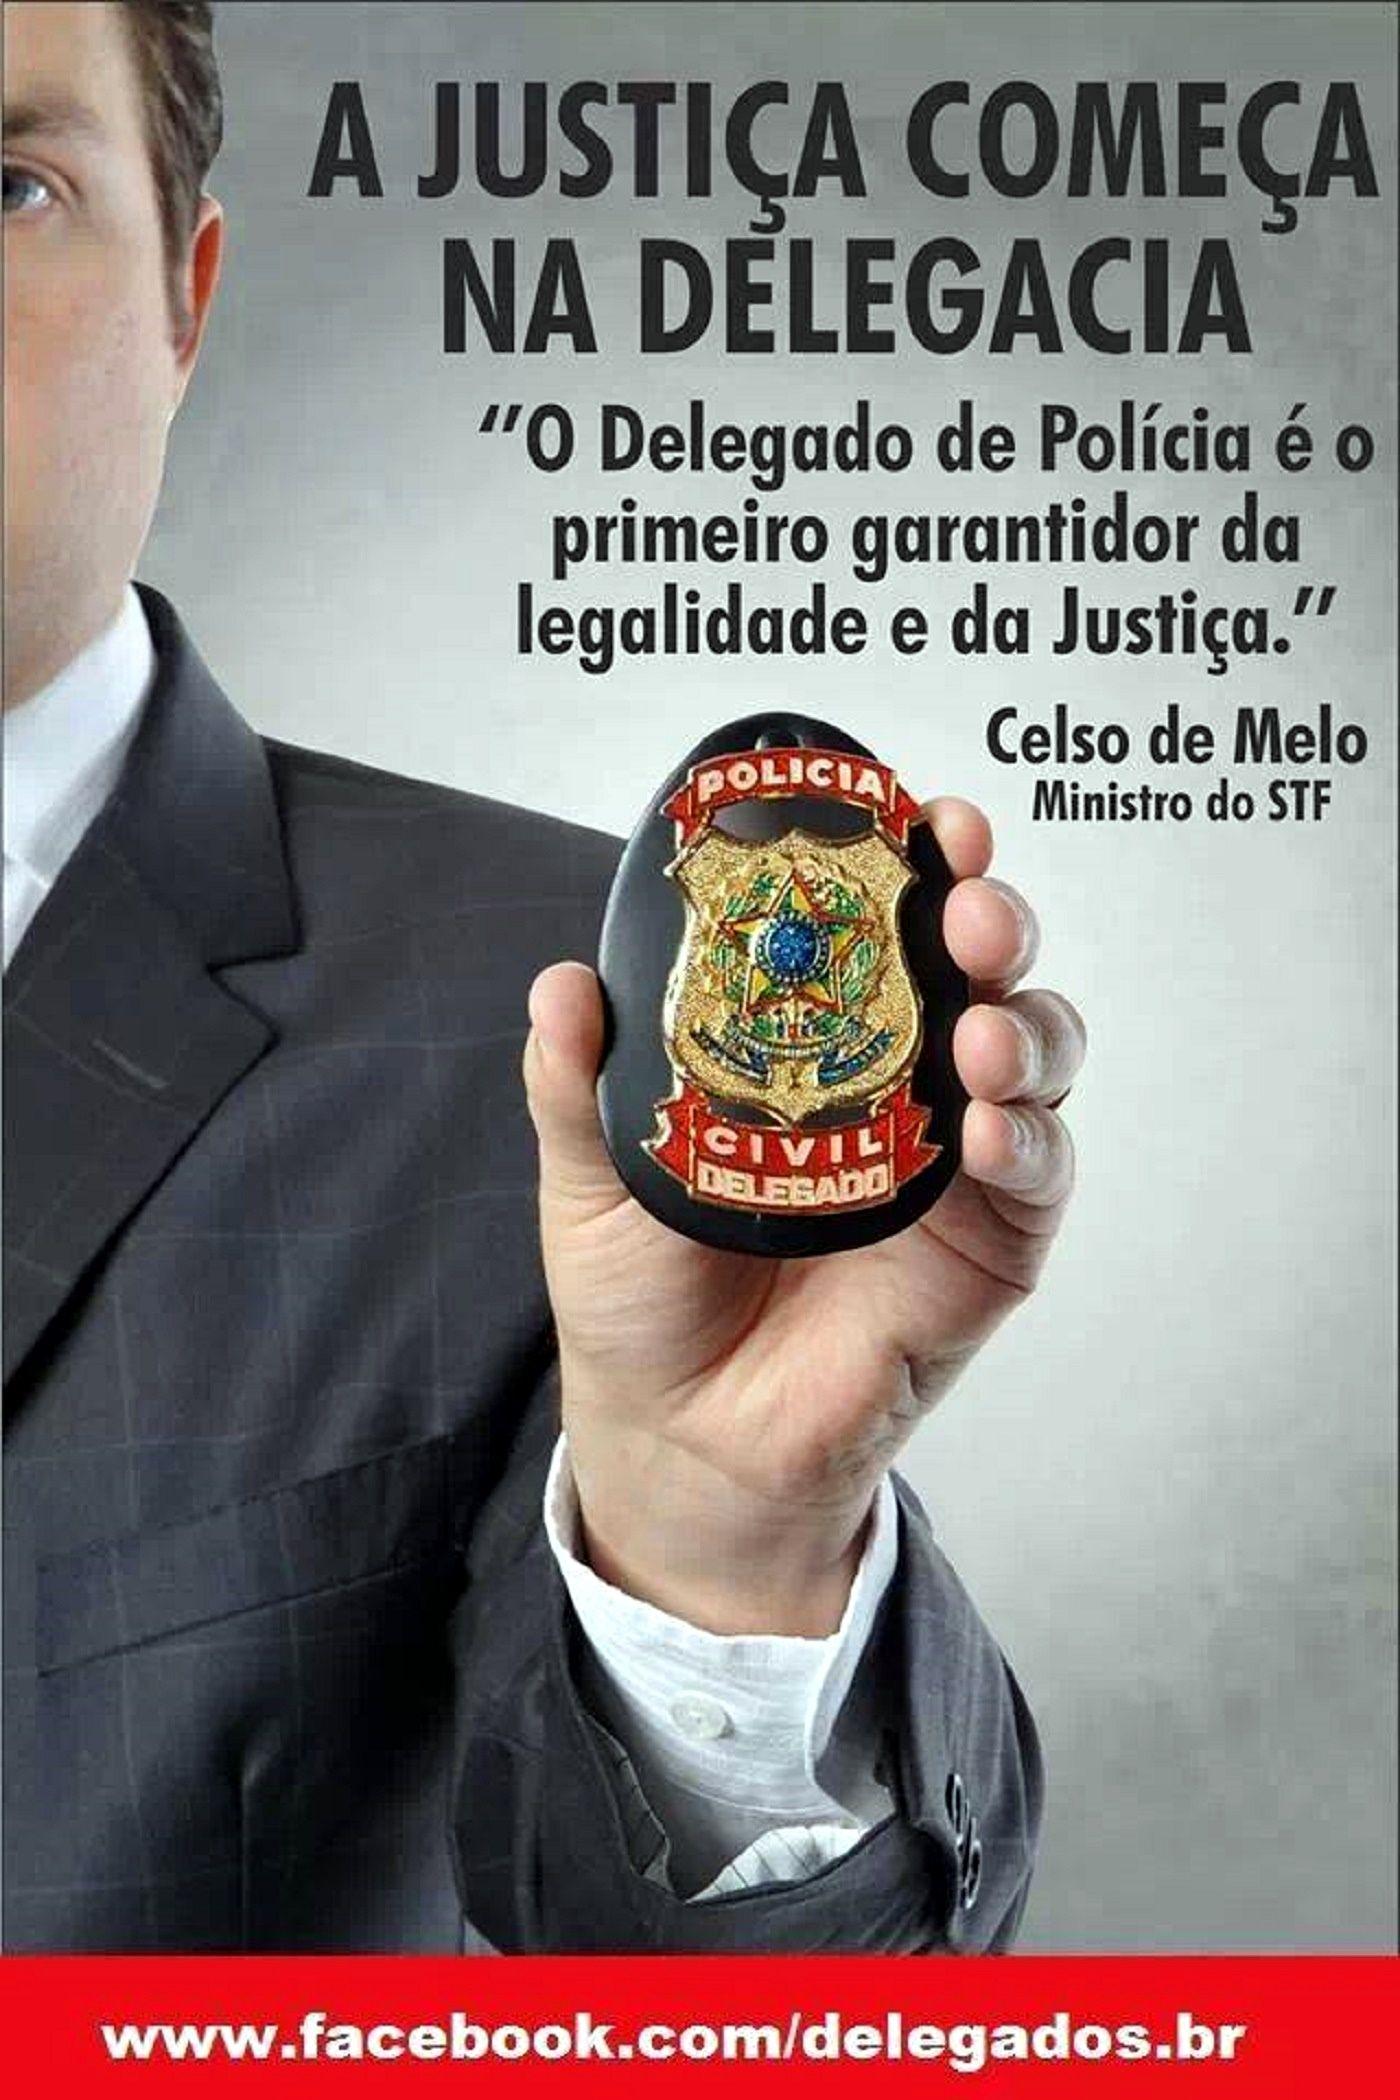 Mulheres na Polícia Civil.  https://www.facebook.com/mulheresnapoliciacivil/photos/a.259403910885436.1073741829.217553075070520/262943090531518/?type=1&theater